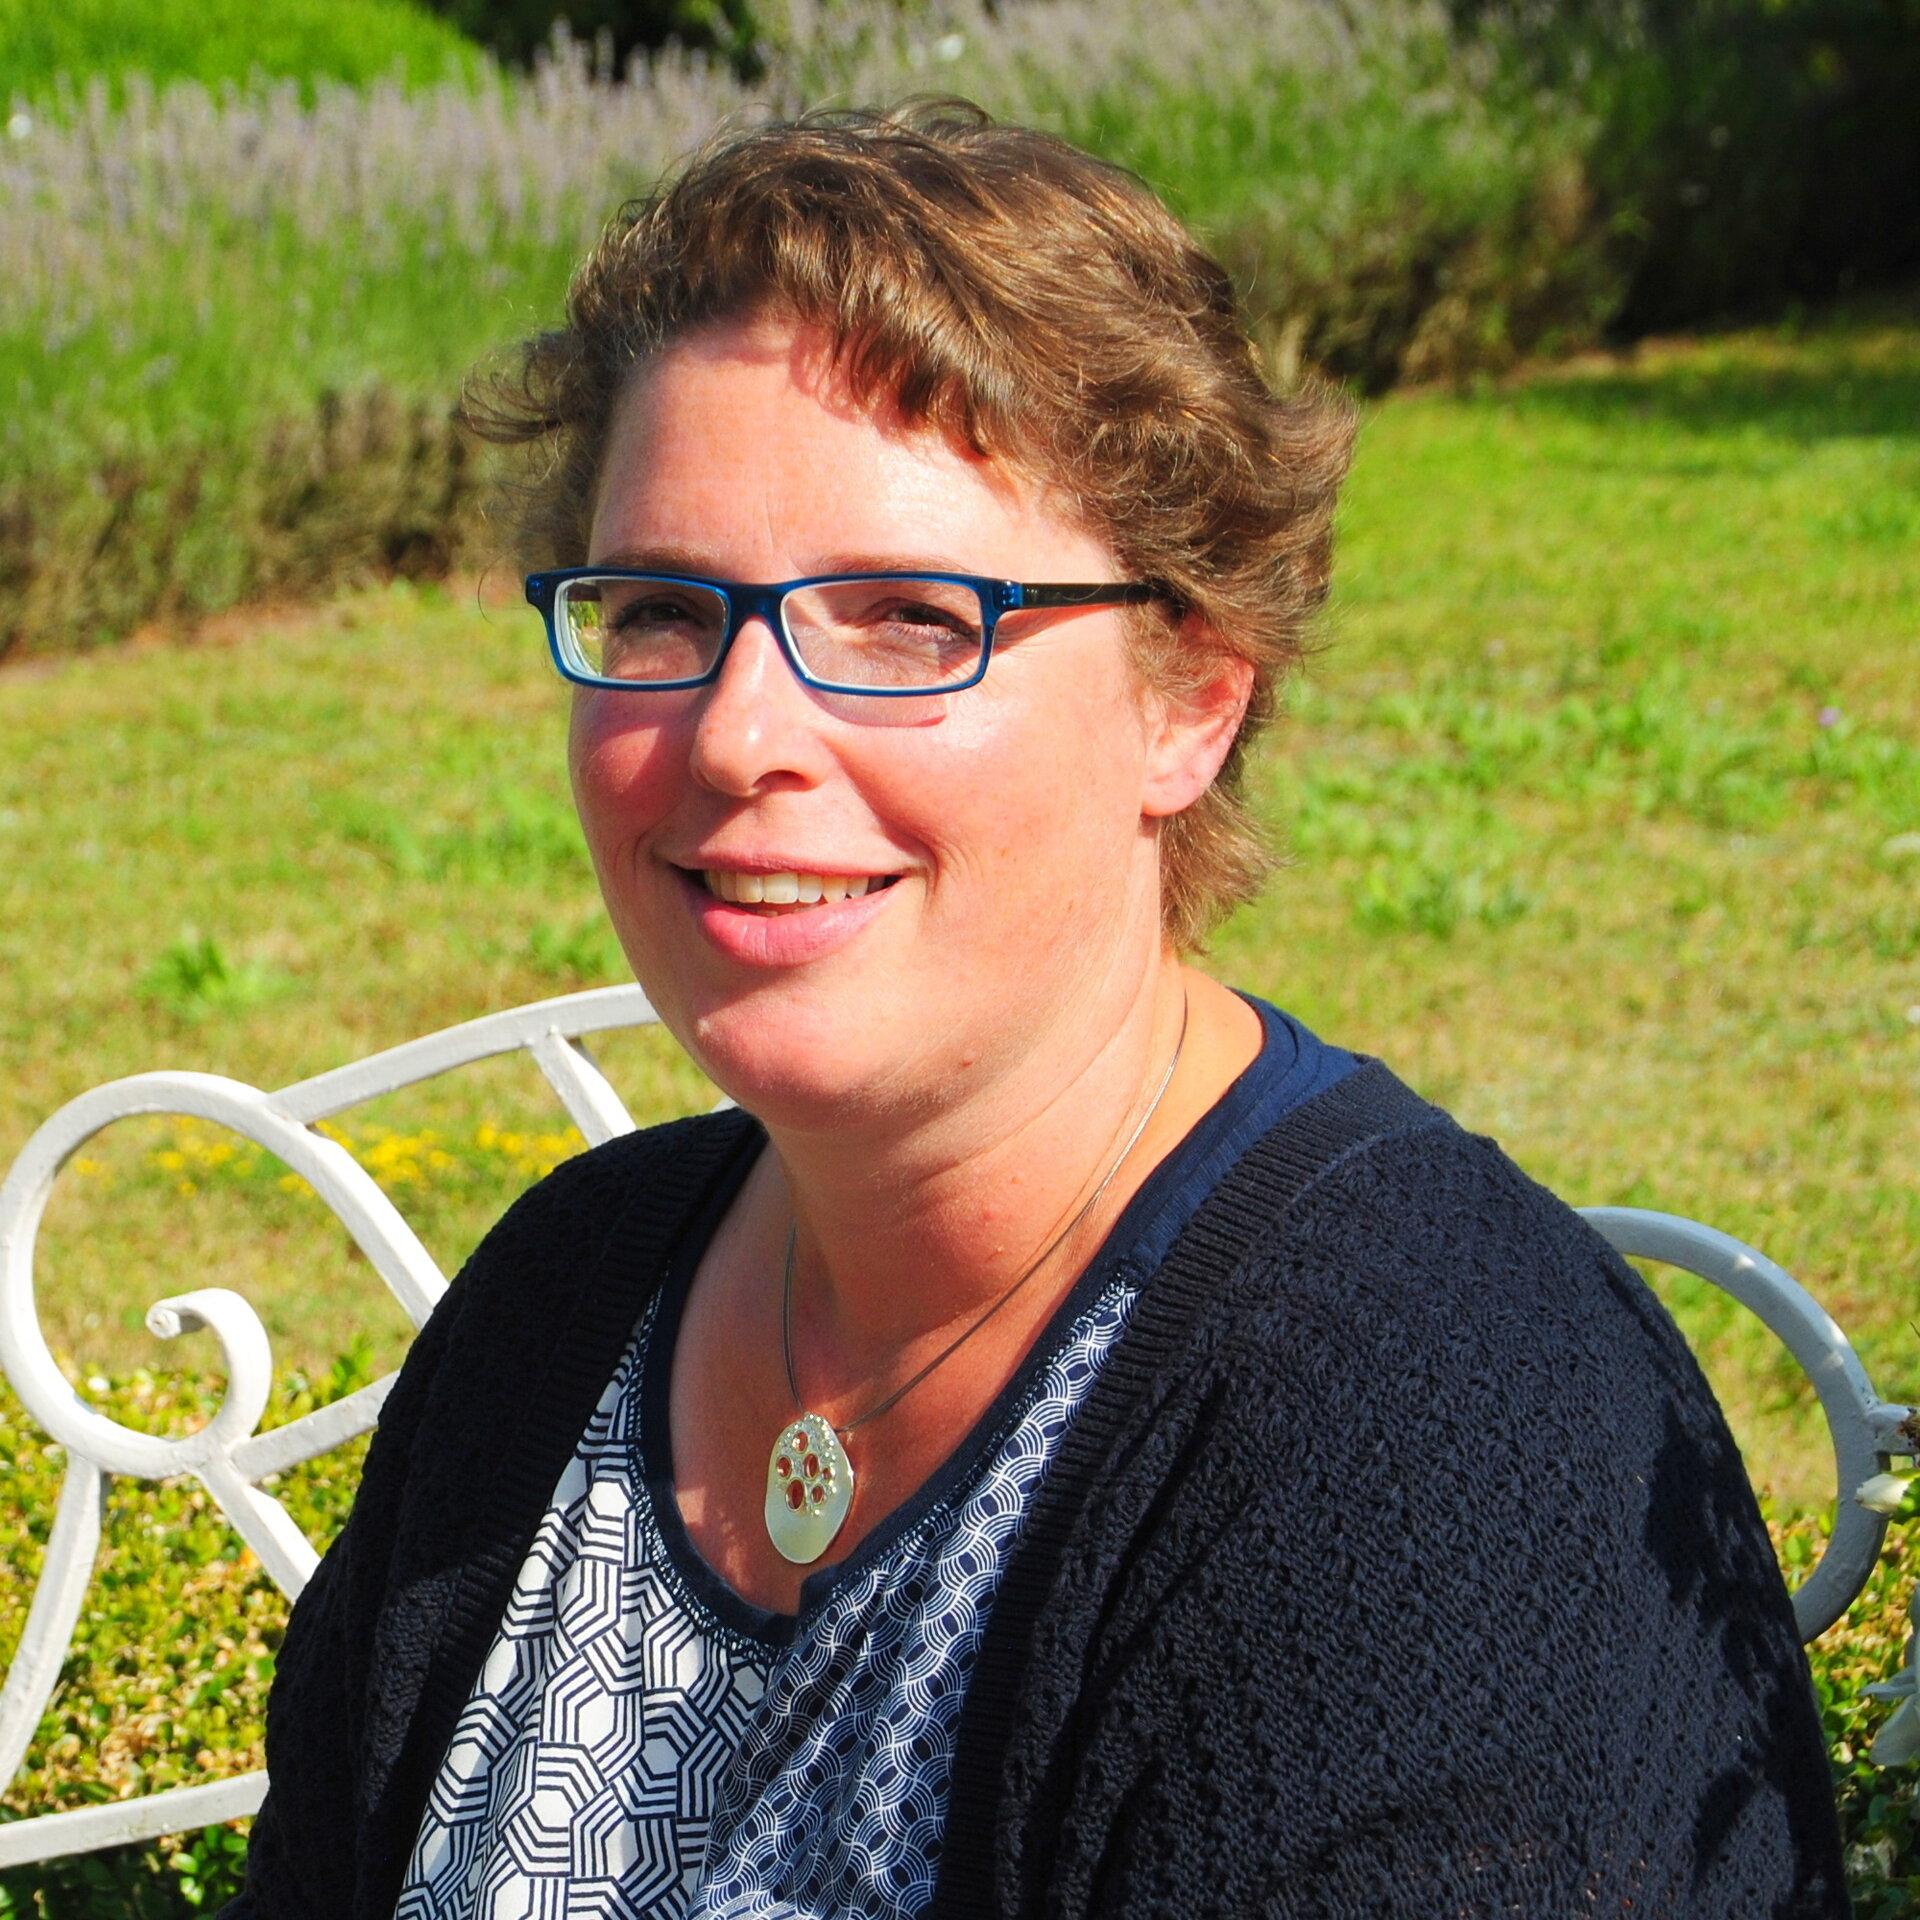 Dorothea Gemmel-Zeimentz